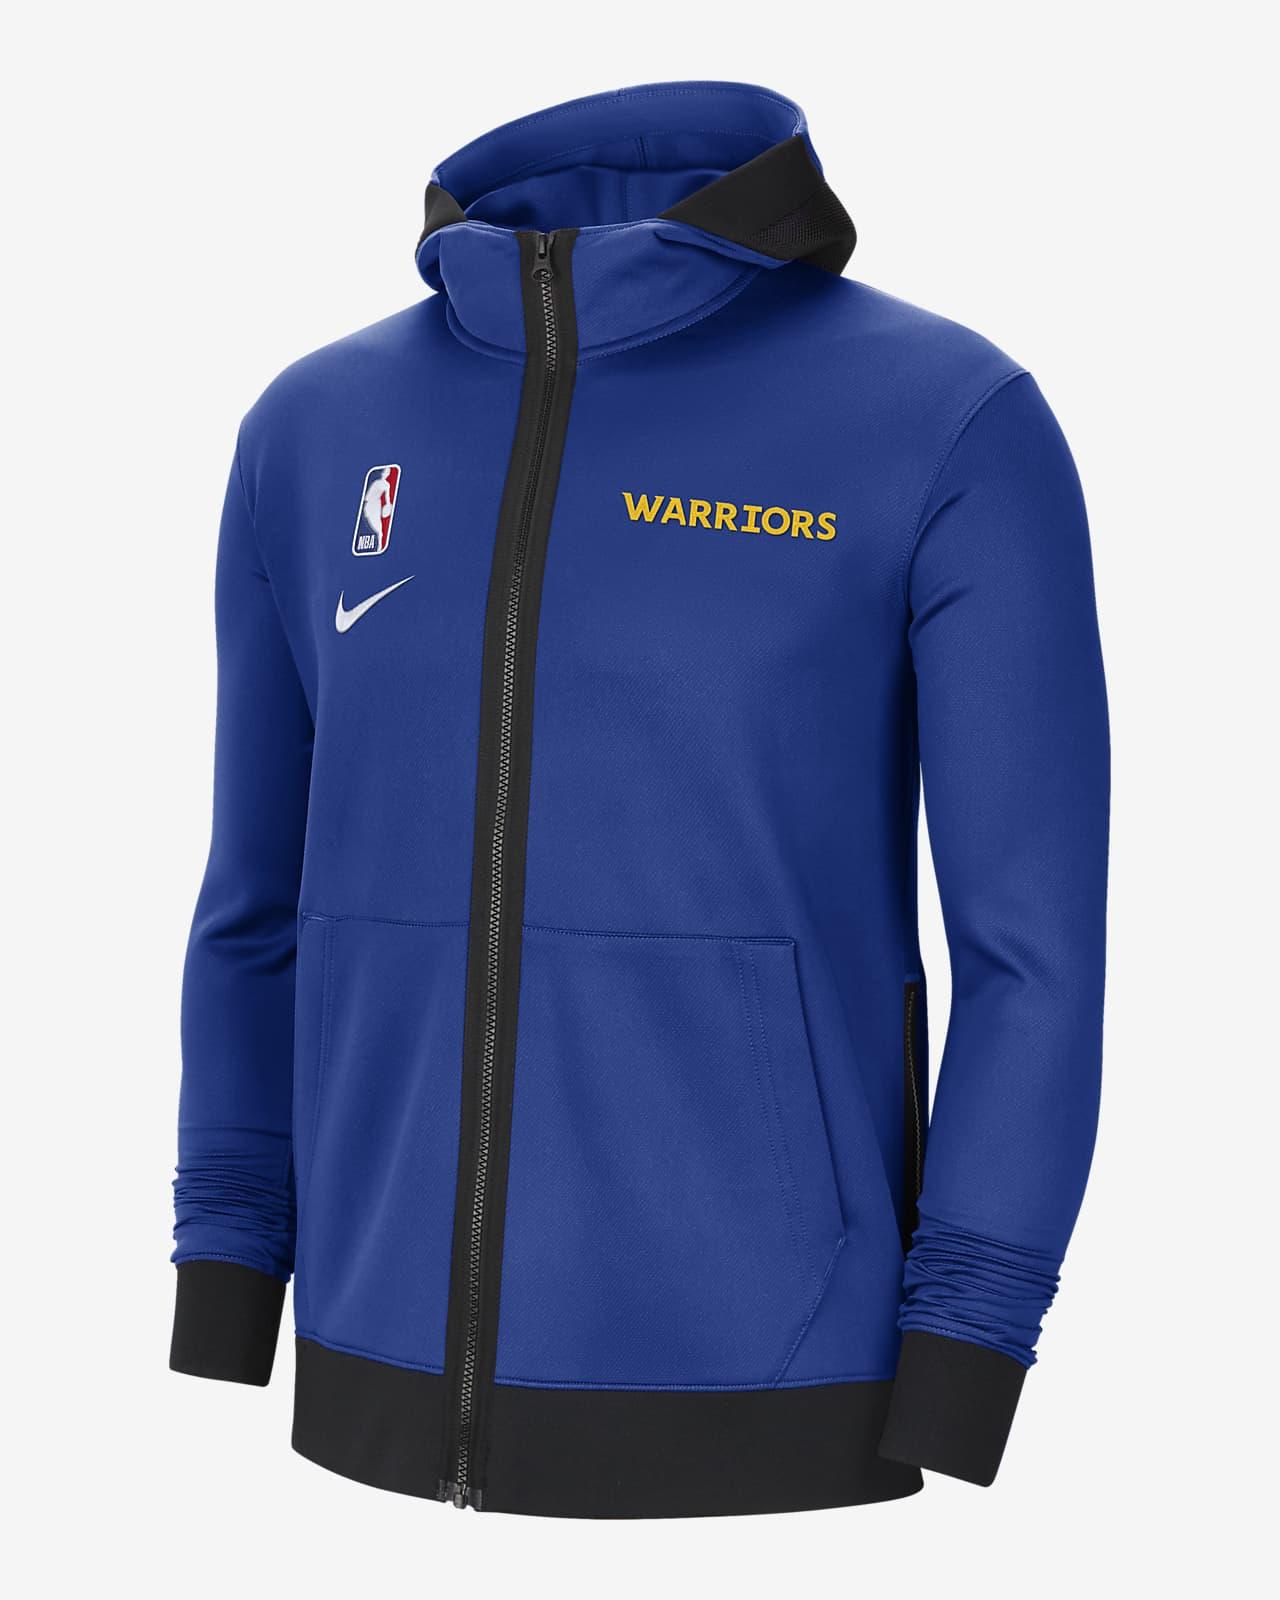 Golden State Warriors Showtime Men's Nike Therma Flex NBA Hoodie